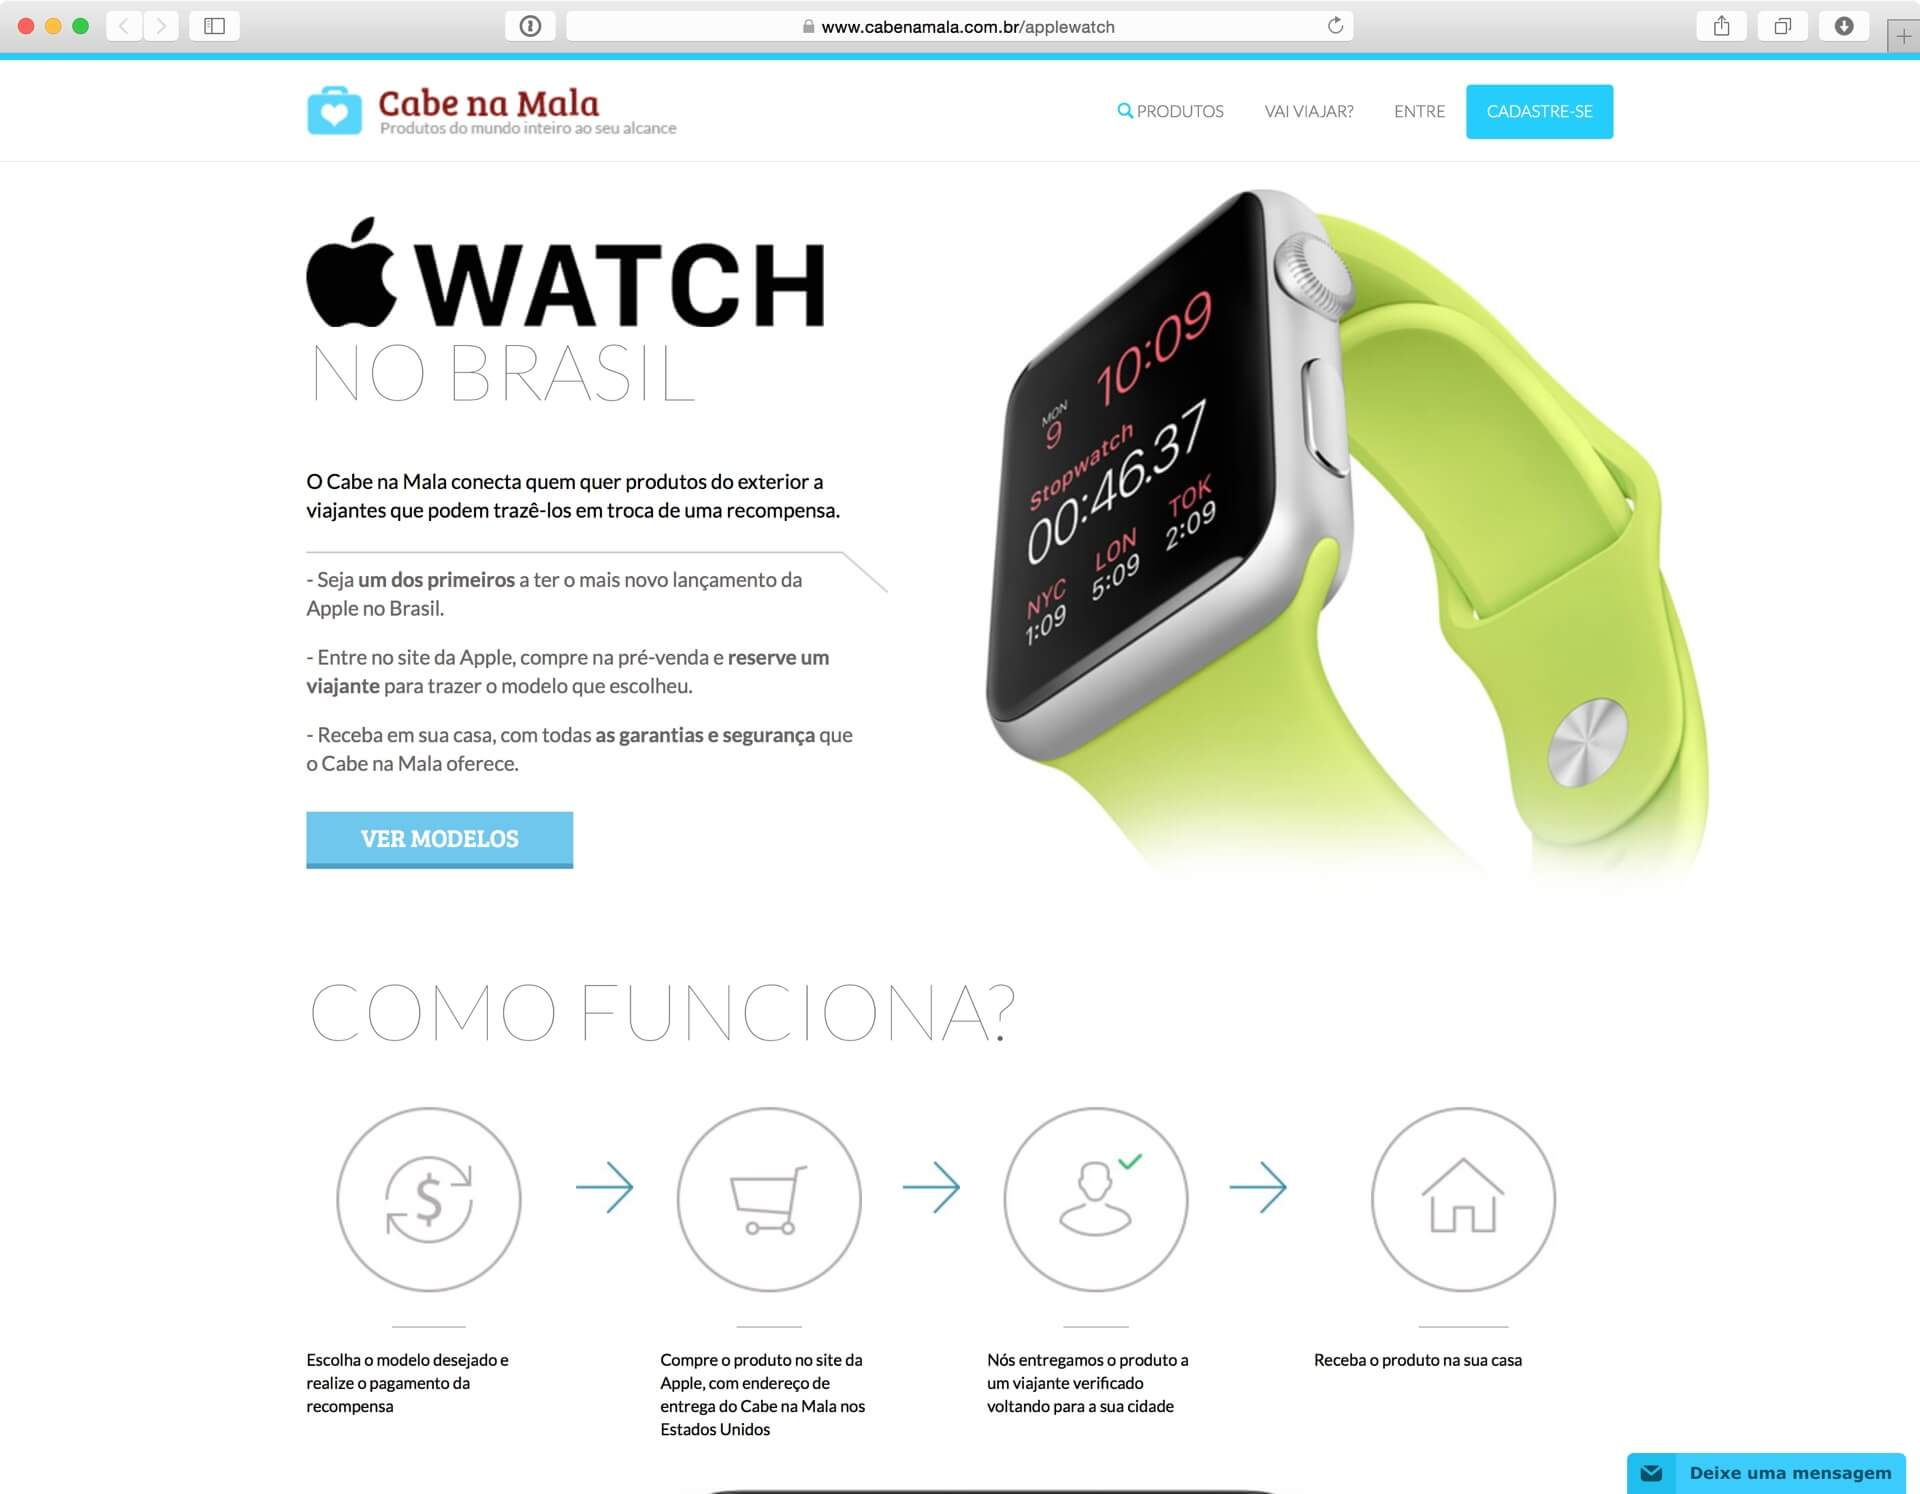 Cabe na Mala - Apple Watch